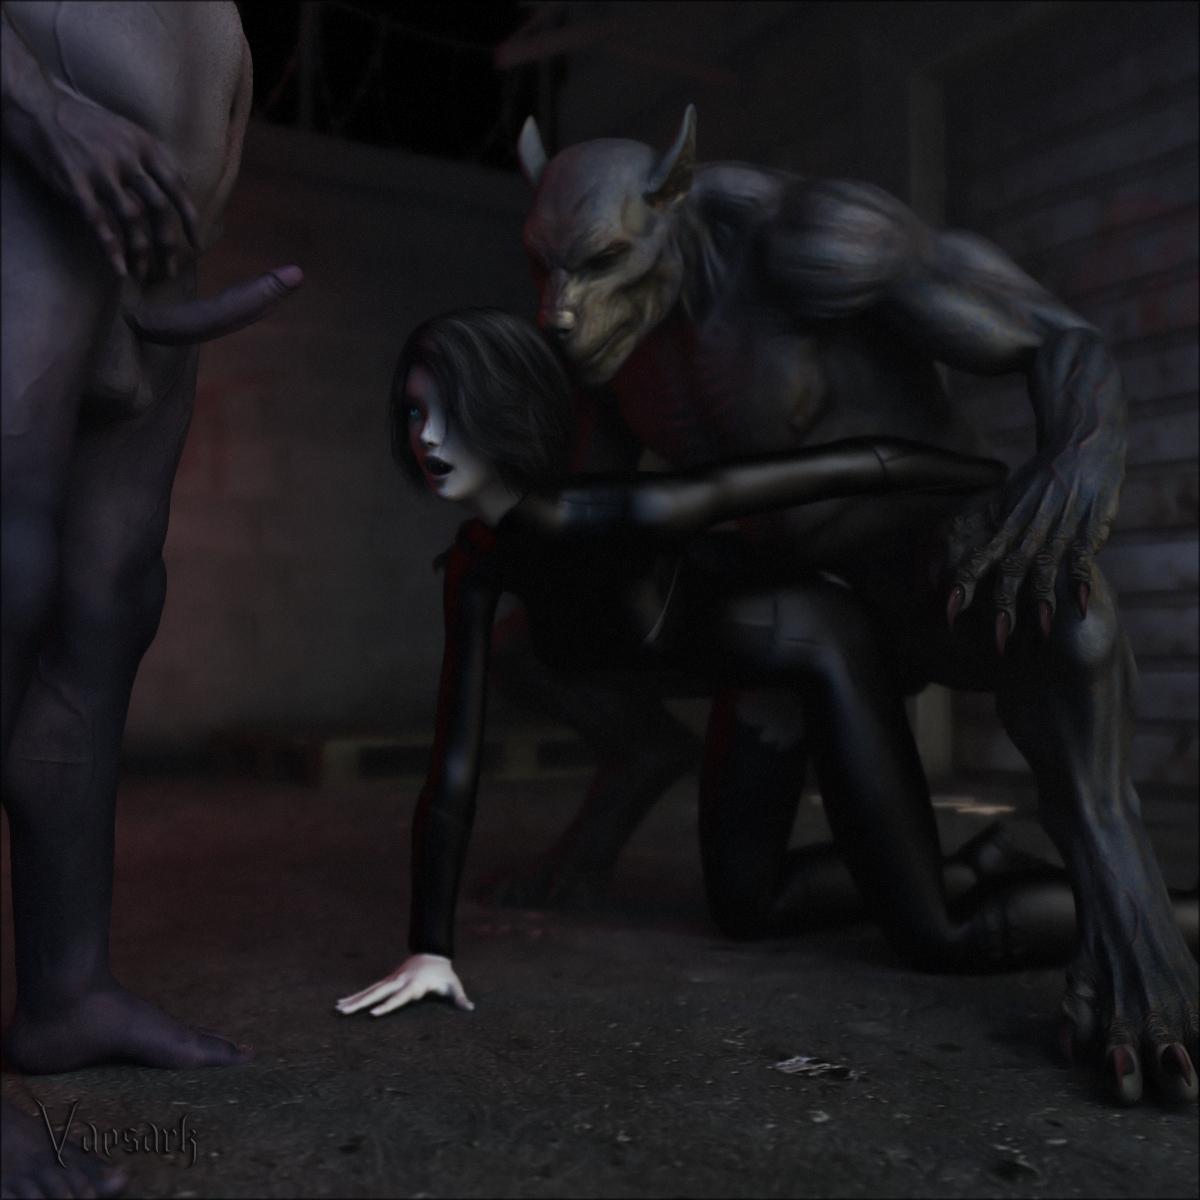 Xxx underworld orcs pornos scene